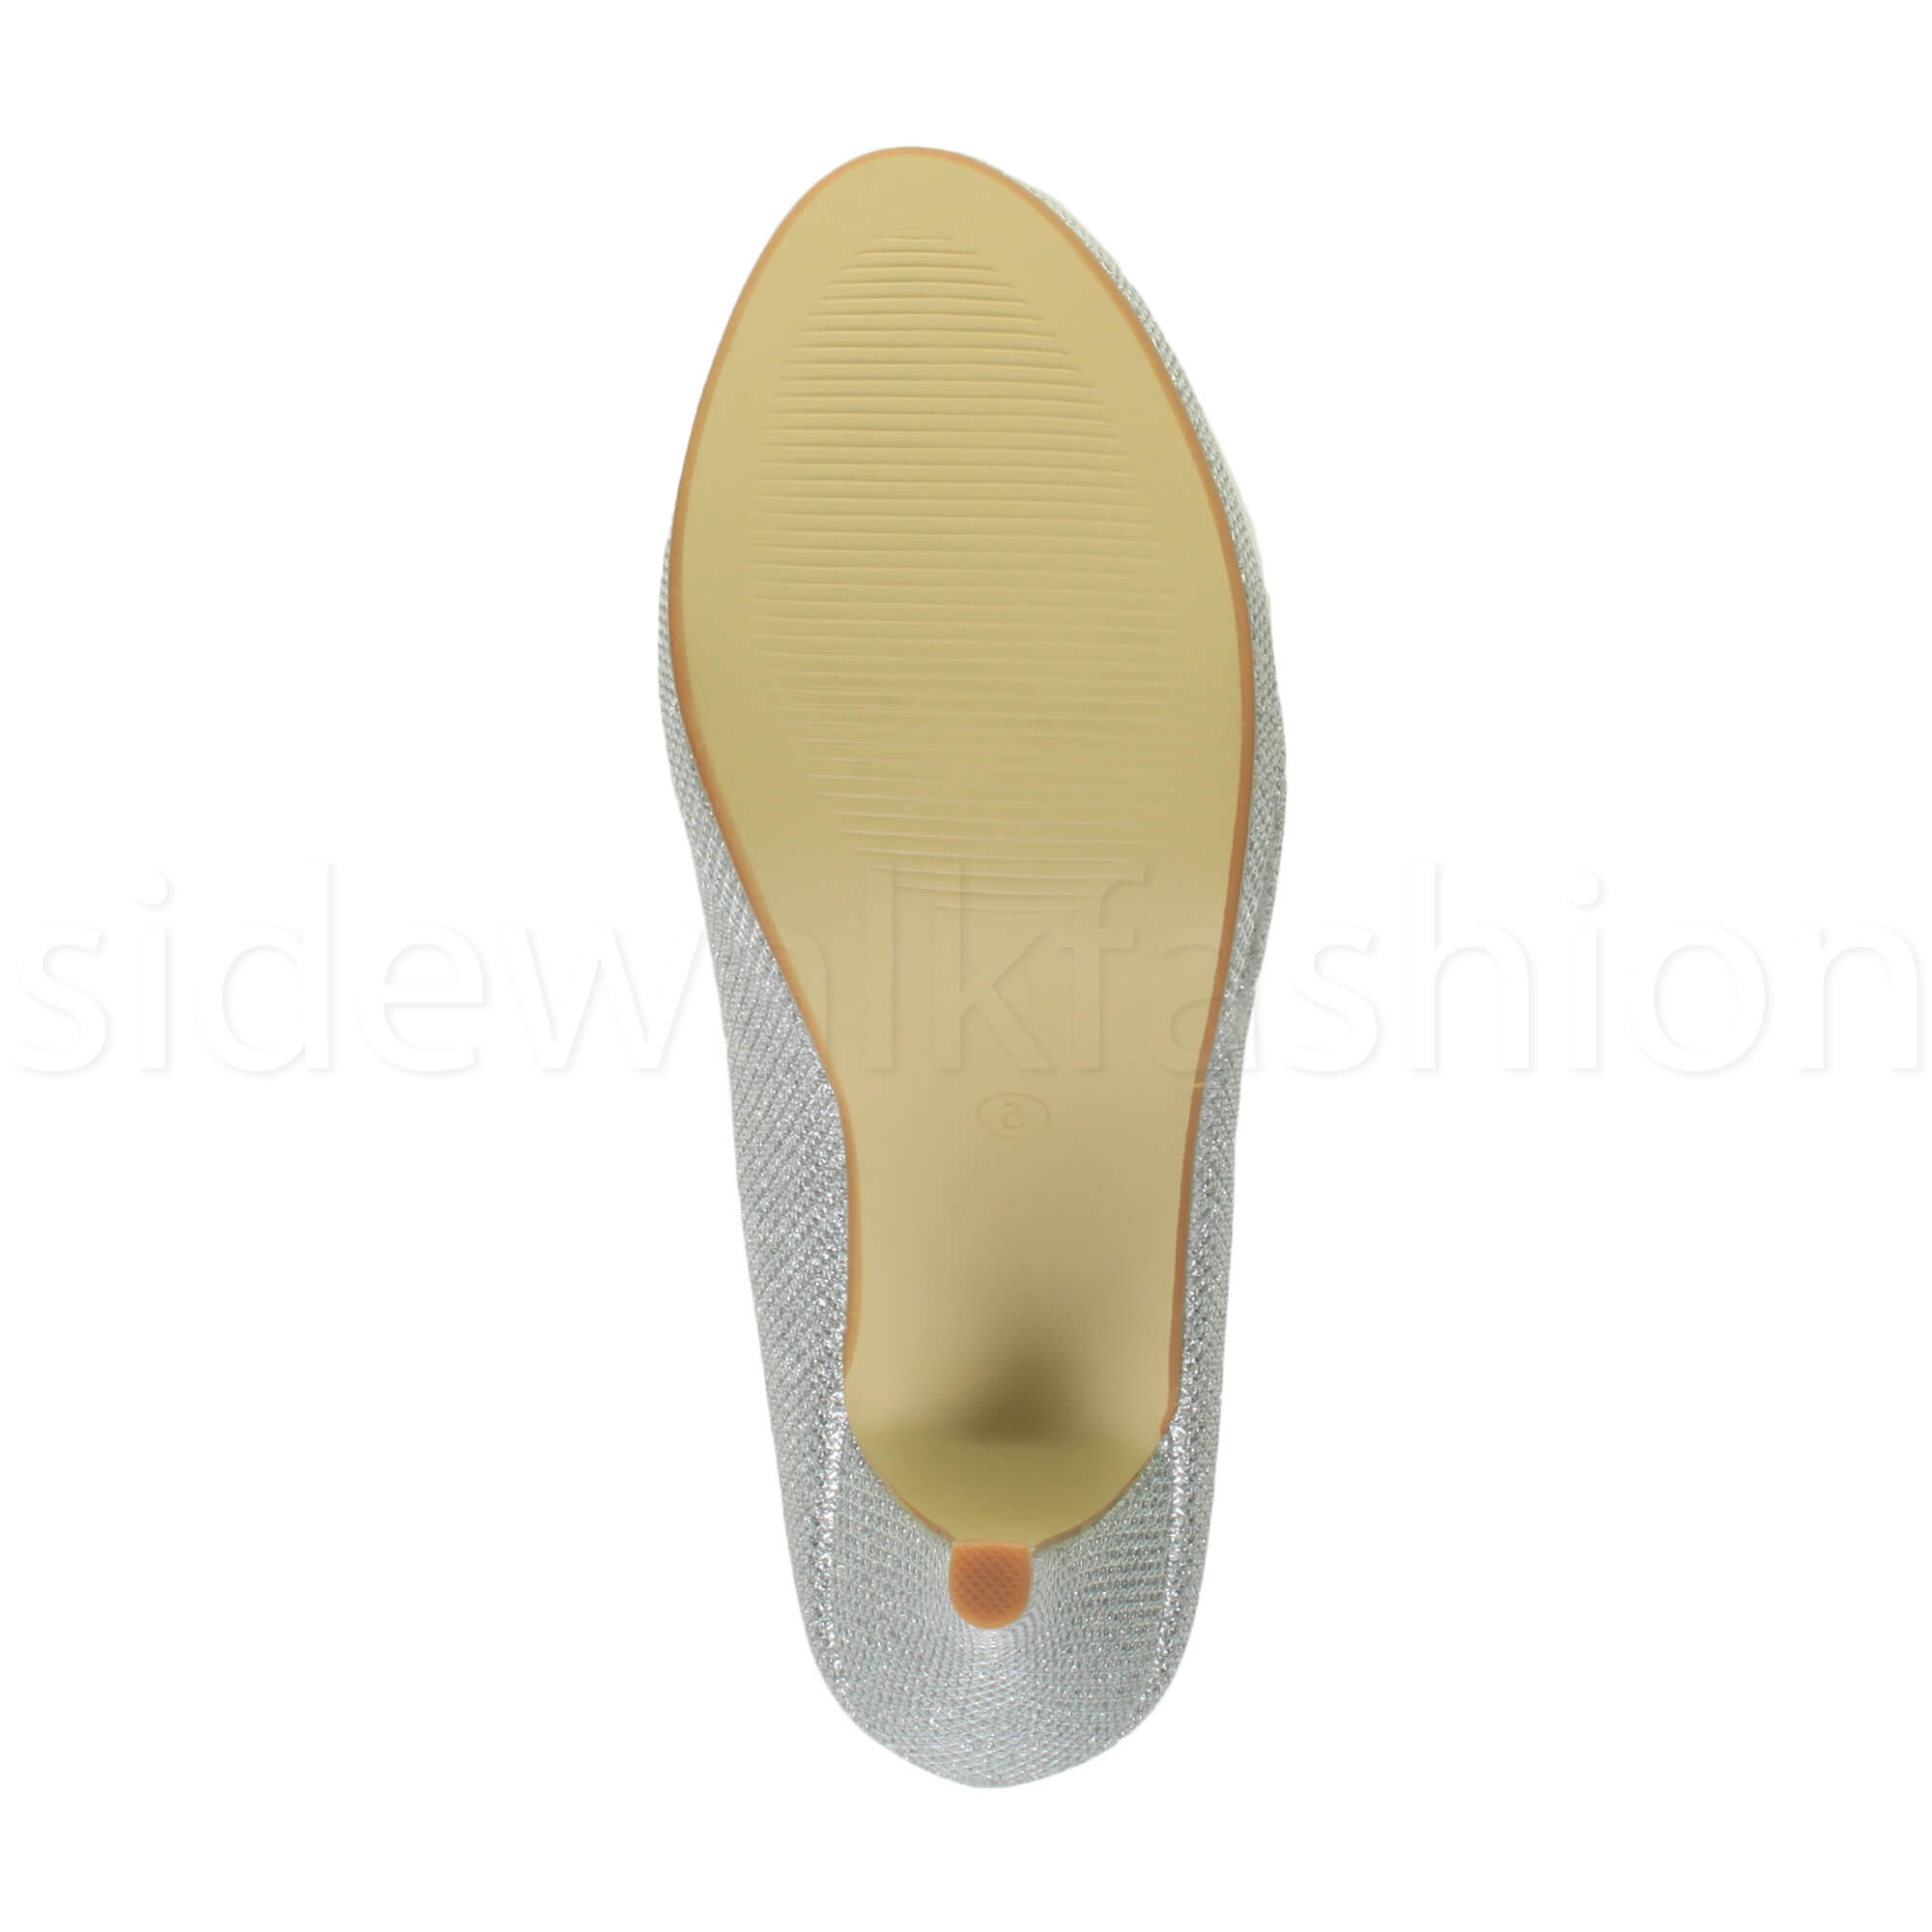 Womens-ladies-high-mid-heel-platform-wedding-evening-bridesmaid-court-shoes-size thumbnail 176